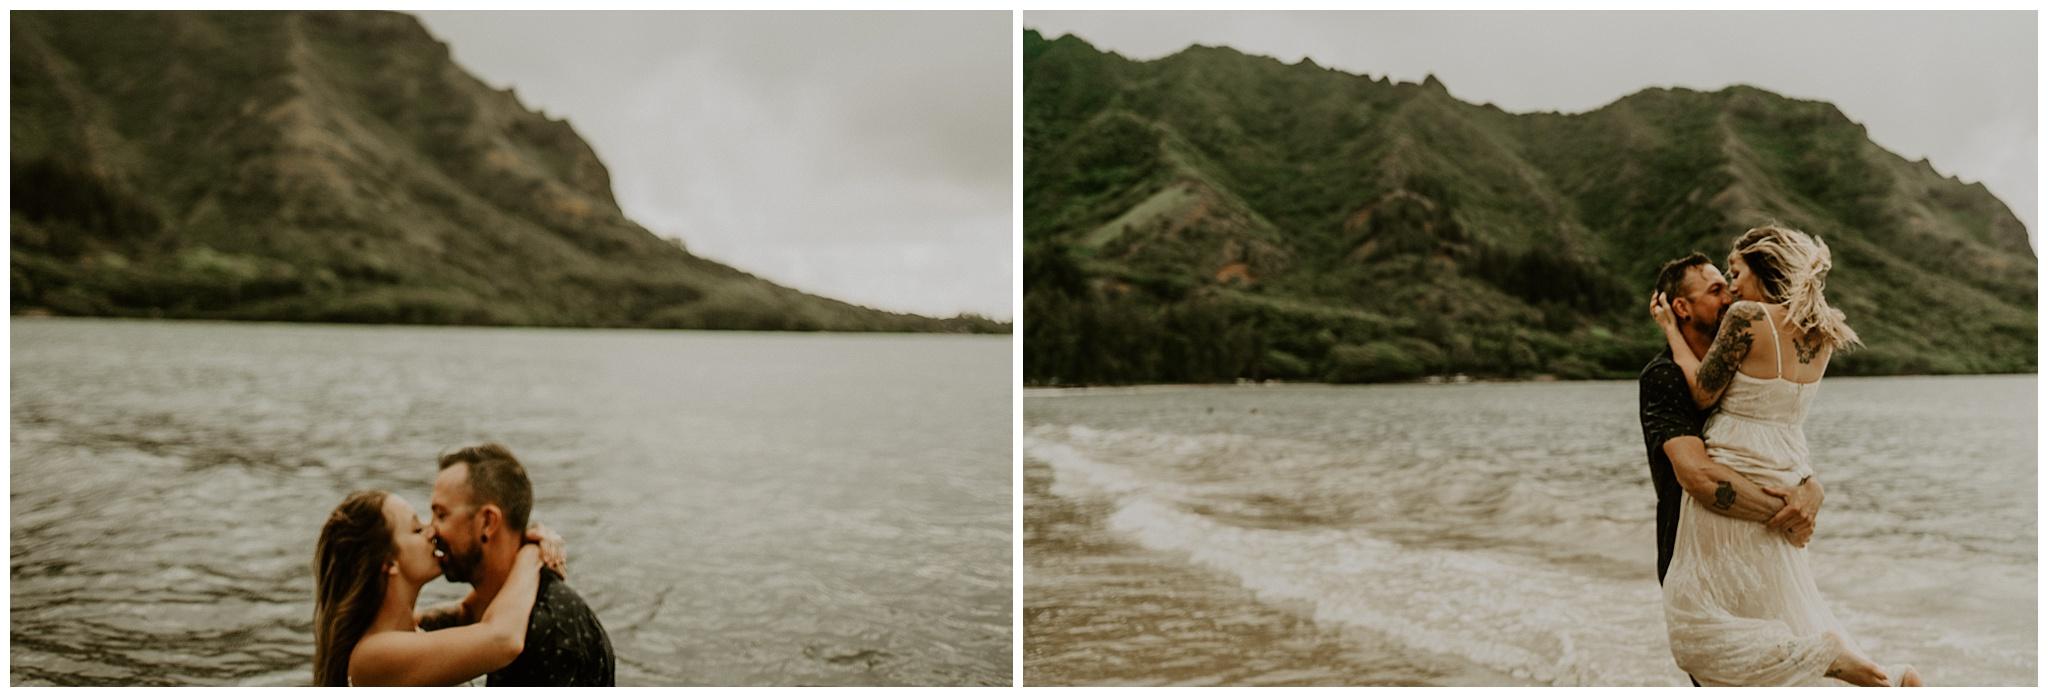 hawaii_anniversary_session8.jpg